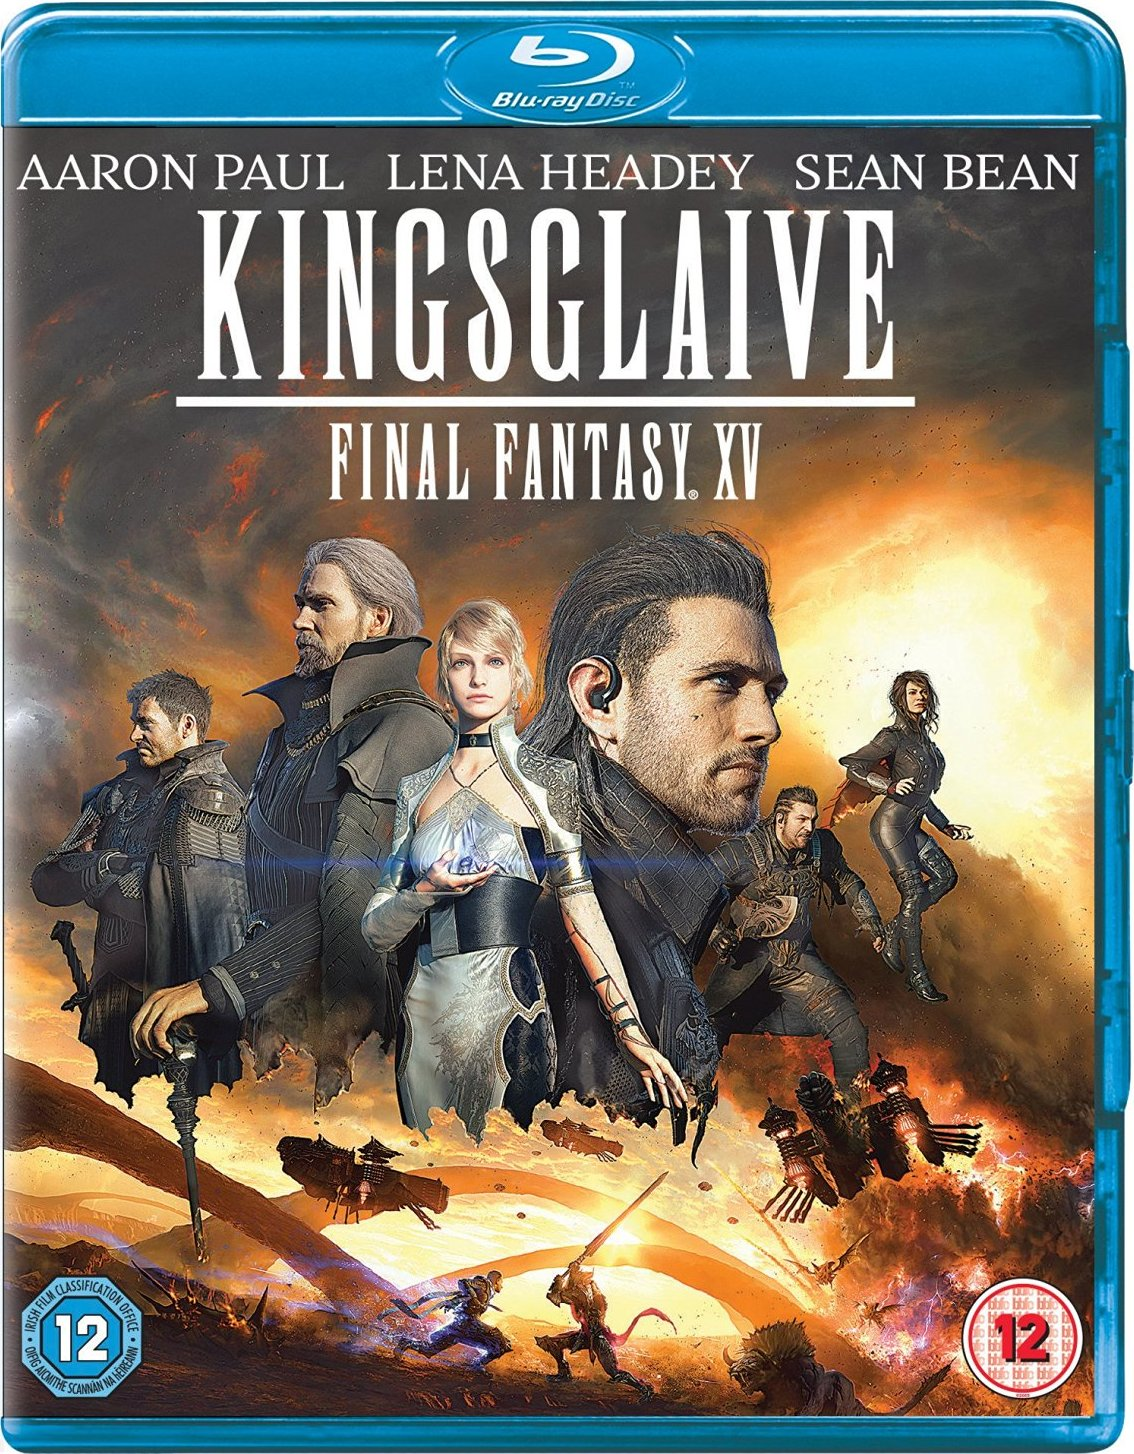 Kingsglaive Final Fantasy Xv 2016 Photo Gallery Imdb